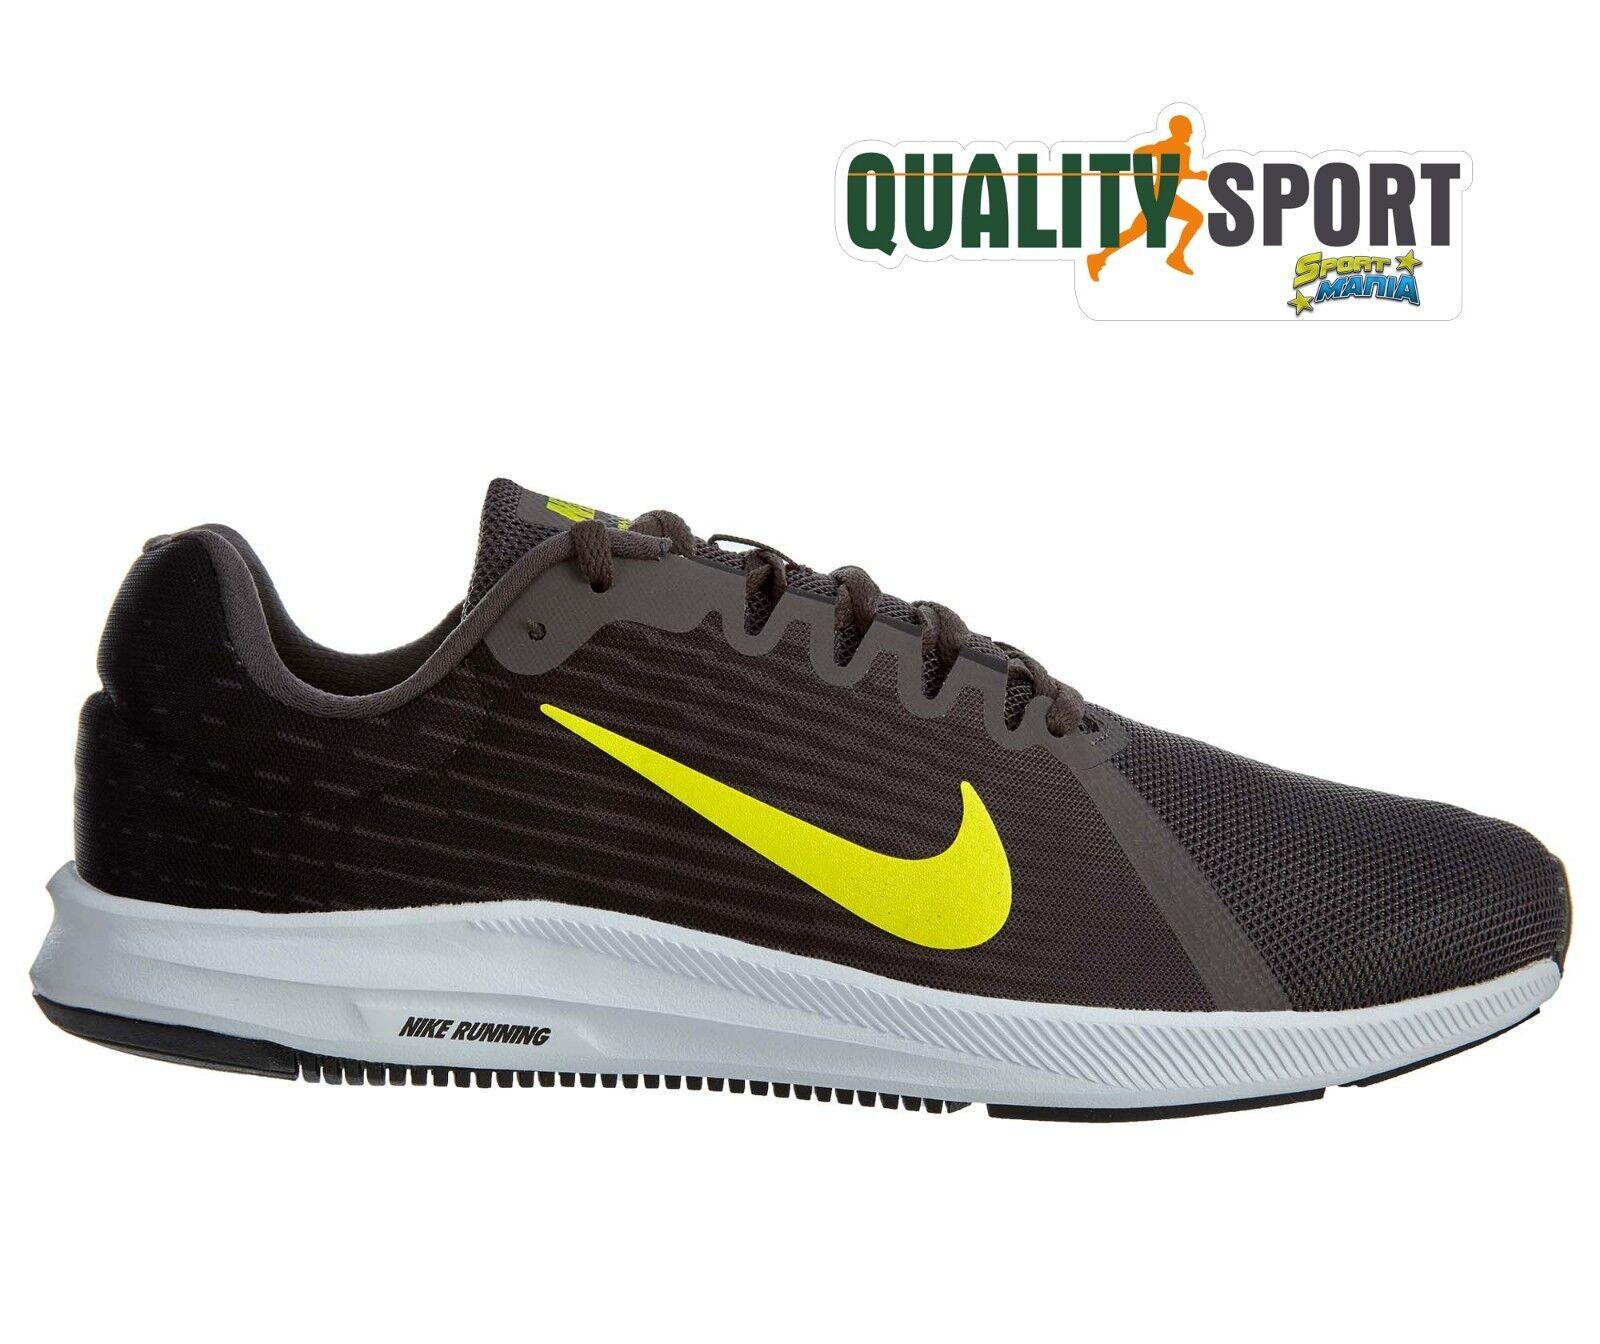 reputable site f6b61 550f0 Nike Uomo Downshifter 8 Grigio Scarpe Shoes Uomo Nike Sportive Running  908984 010 2018 c1e6f6